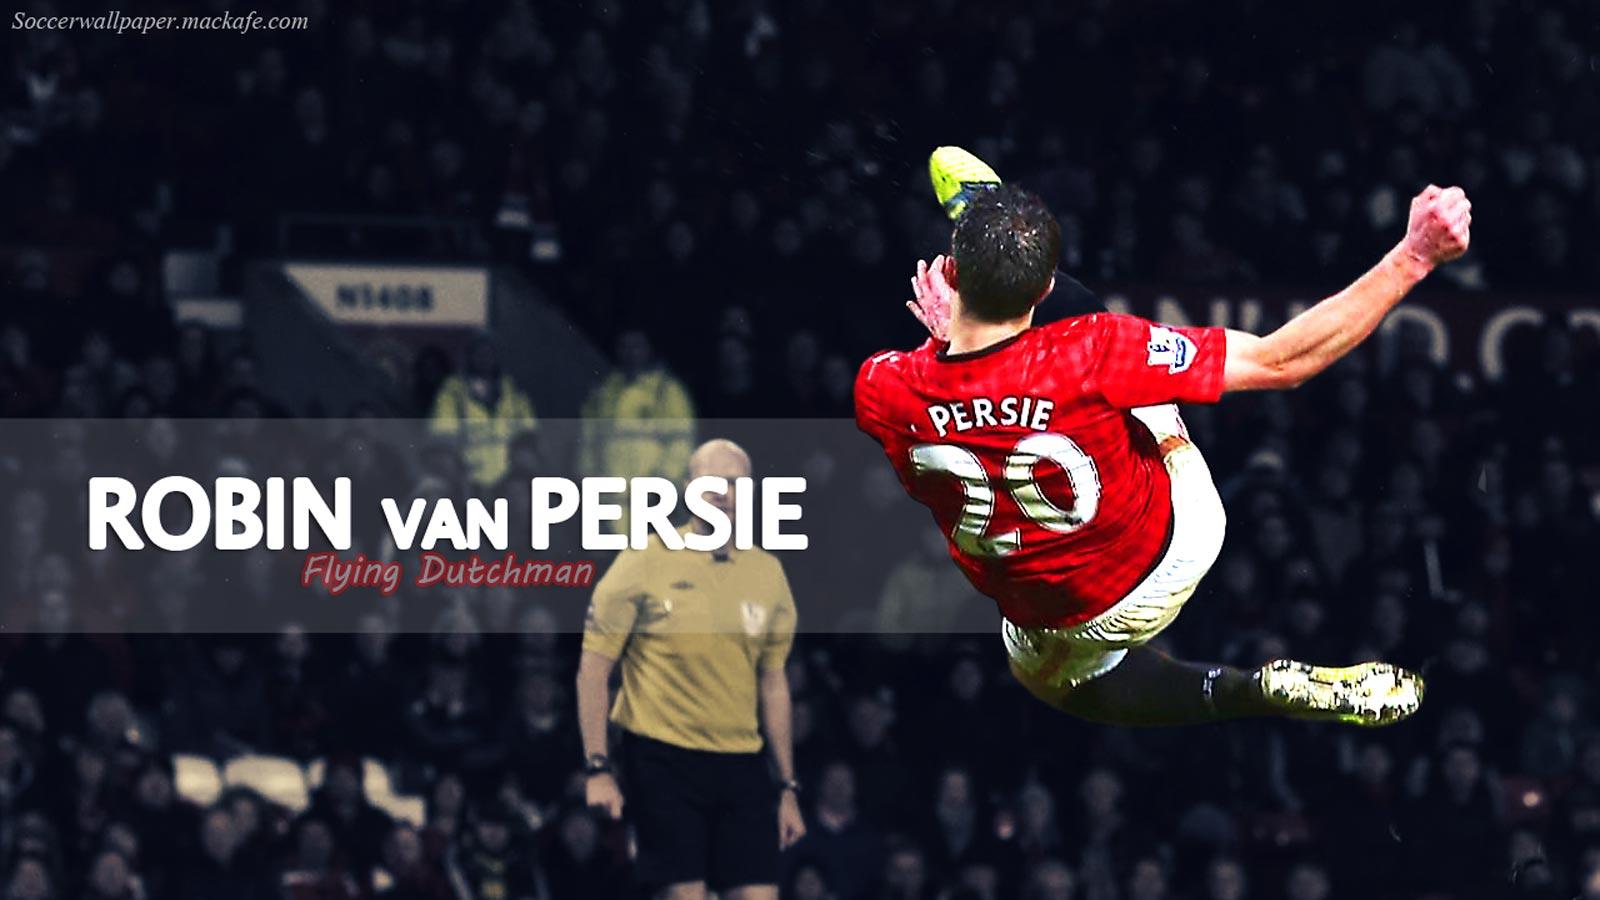 Robin Van Persie Football Wallpaper